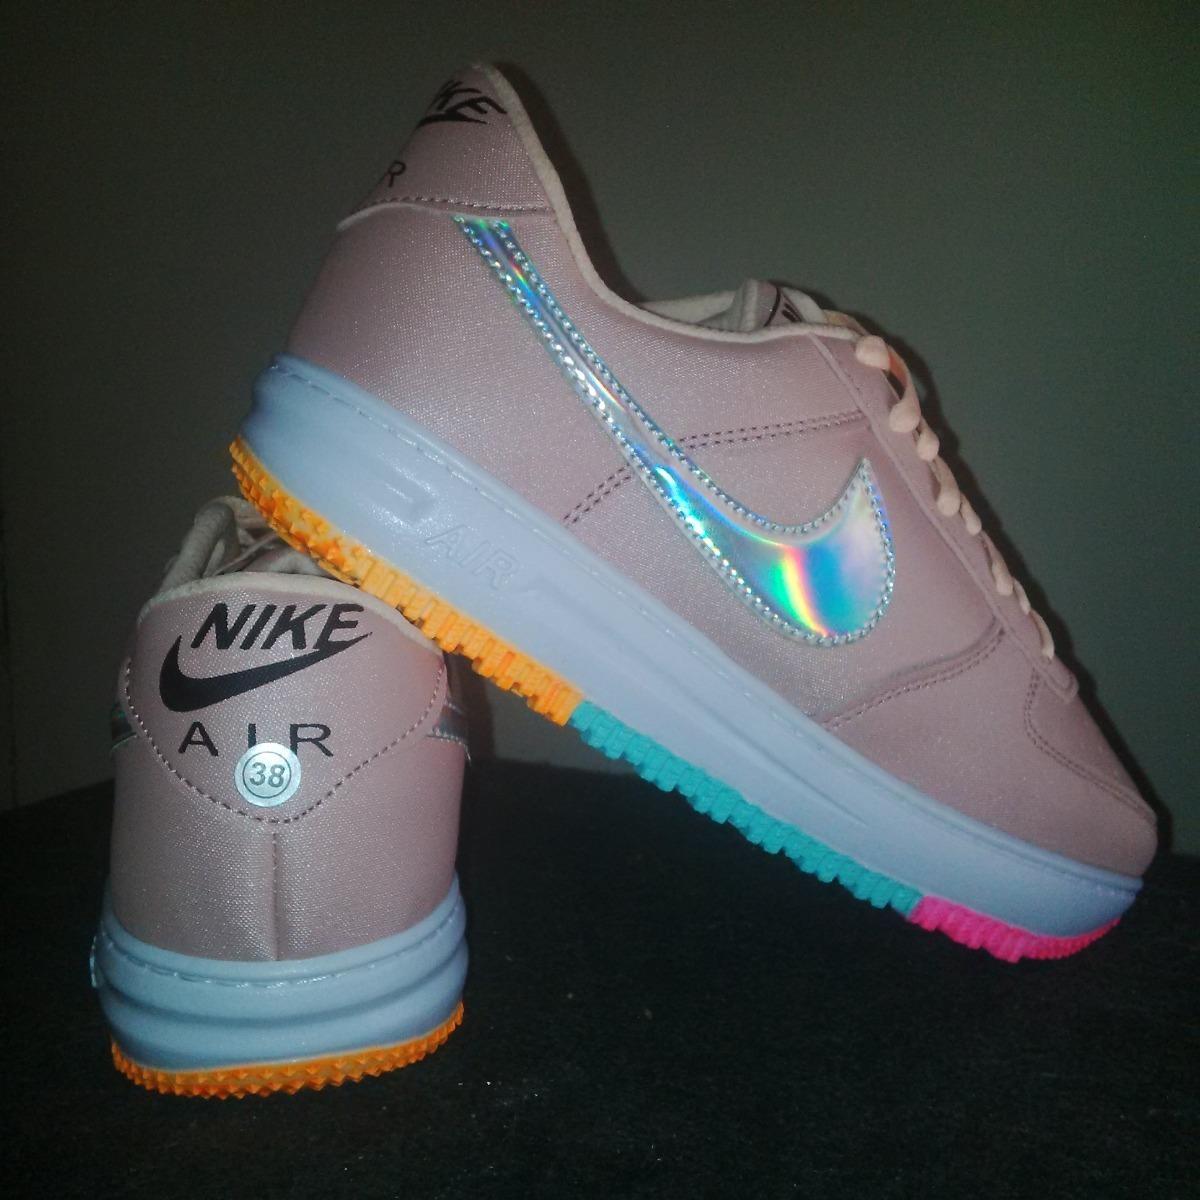 Zapatos Nike Air Max Arcoiris Dama Gym Colombianos